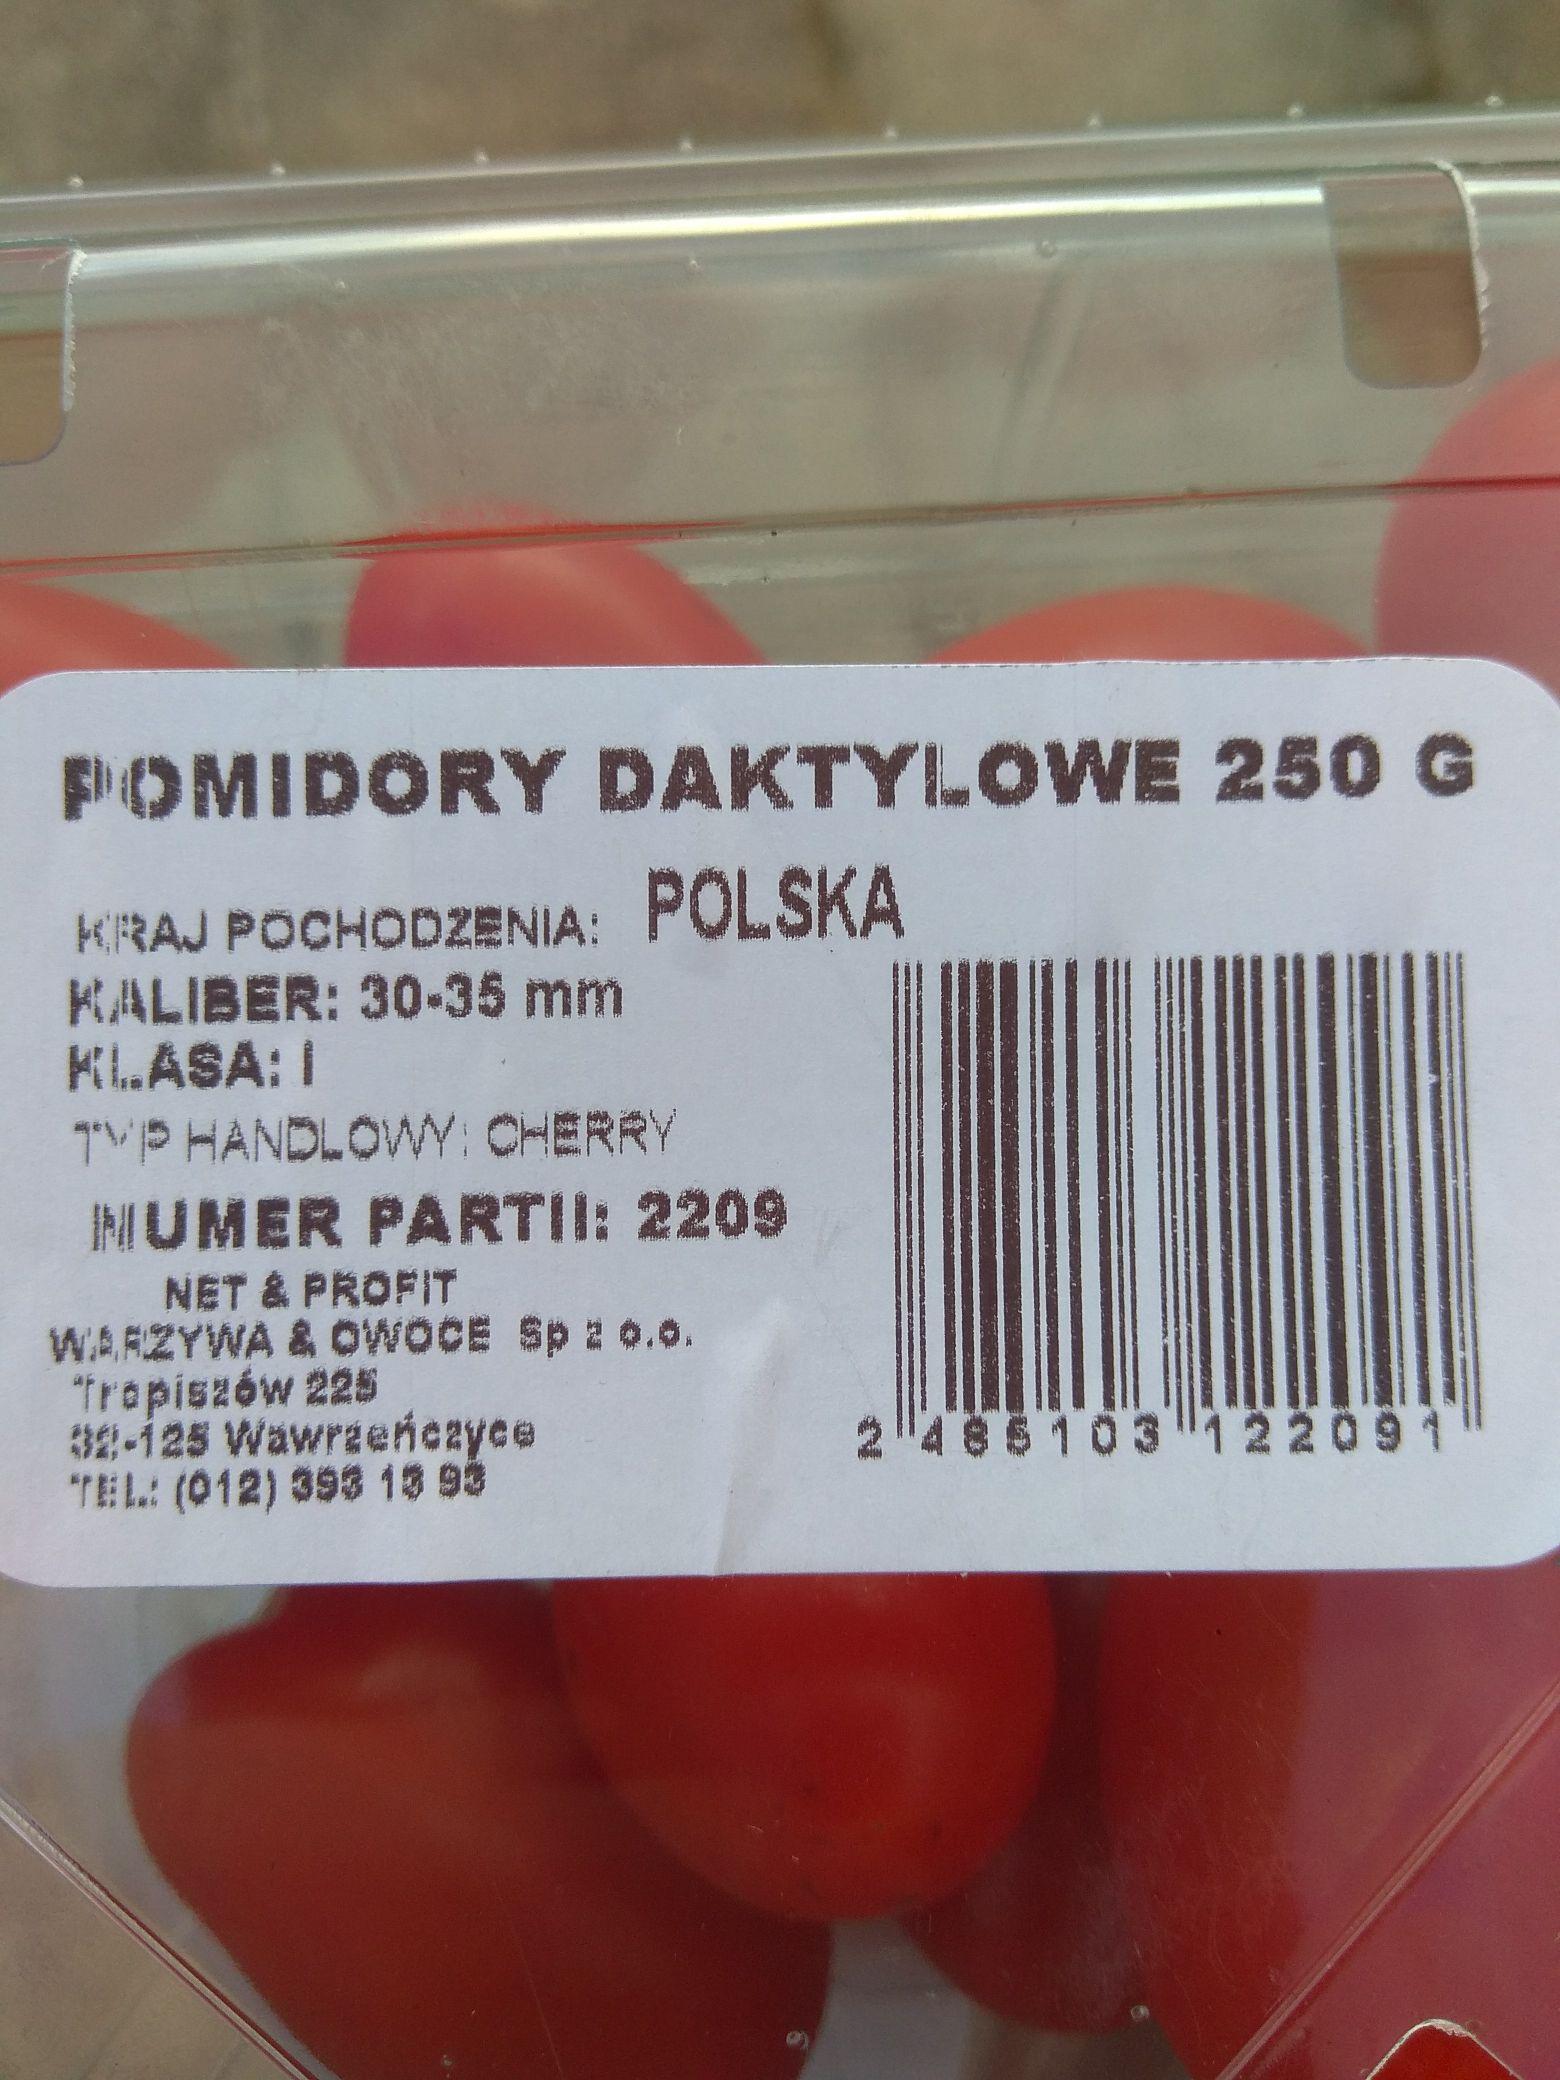 Pomidory Daktylowe